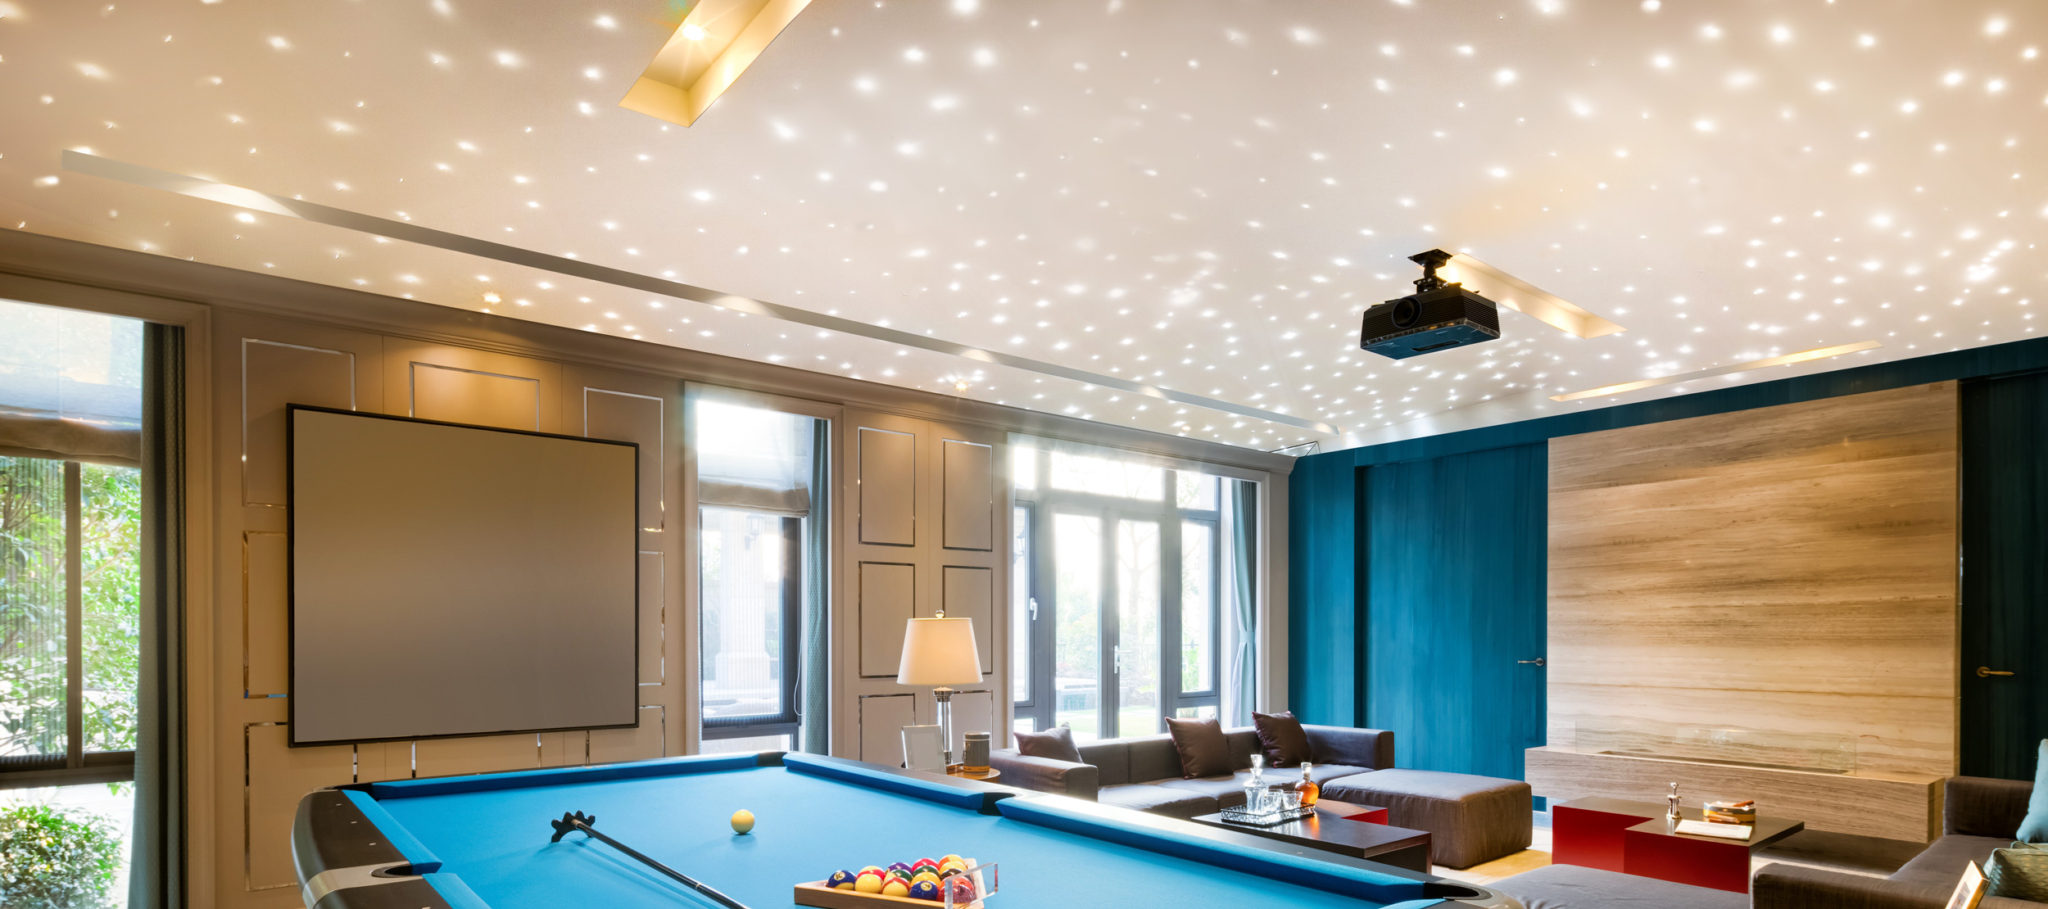 Fiber Optic Starfield Ceiling - Game Room